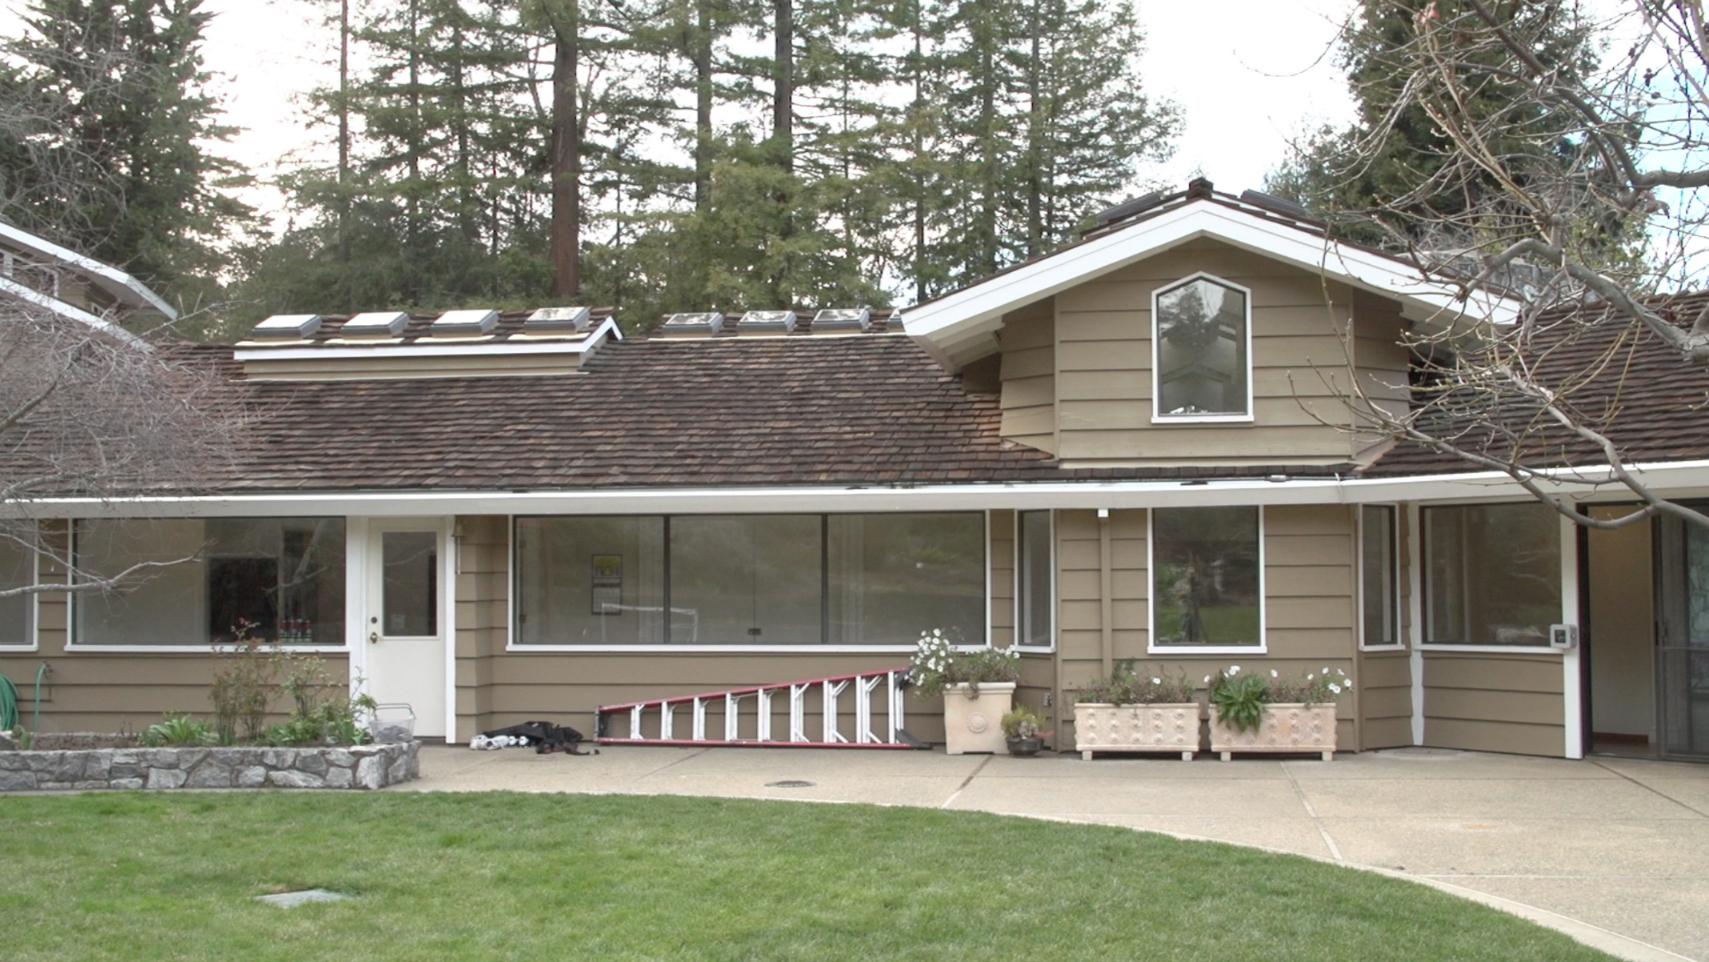 Meta's Productive Portola Valley Ranch | TC Cribs